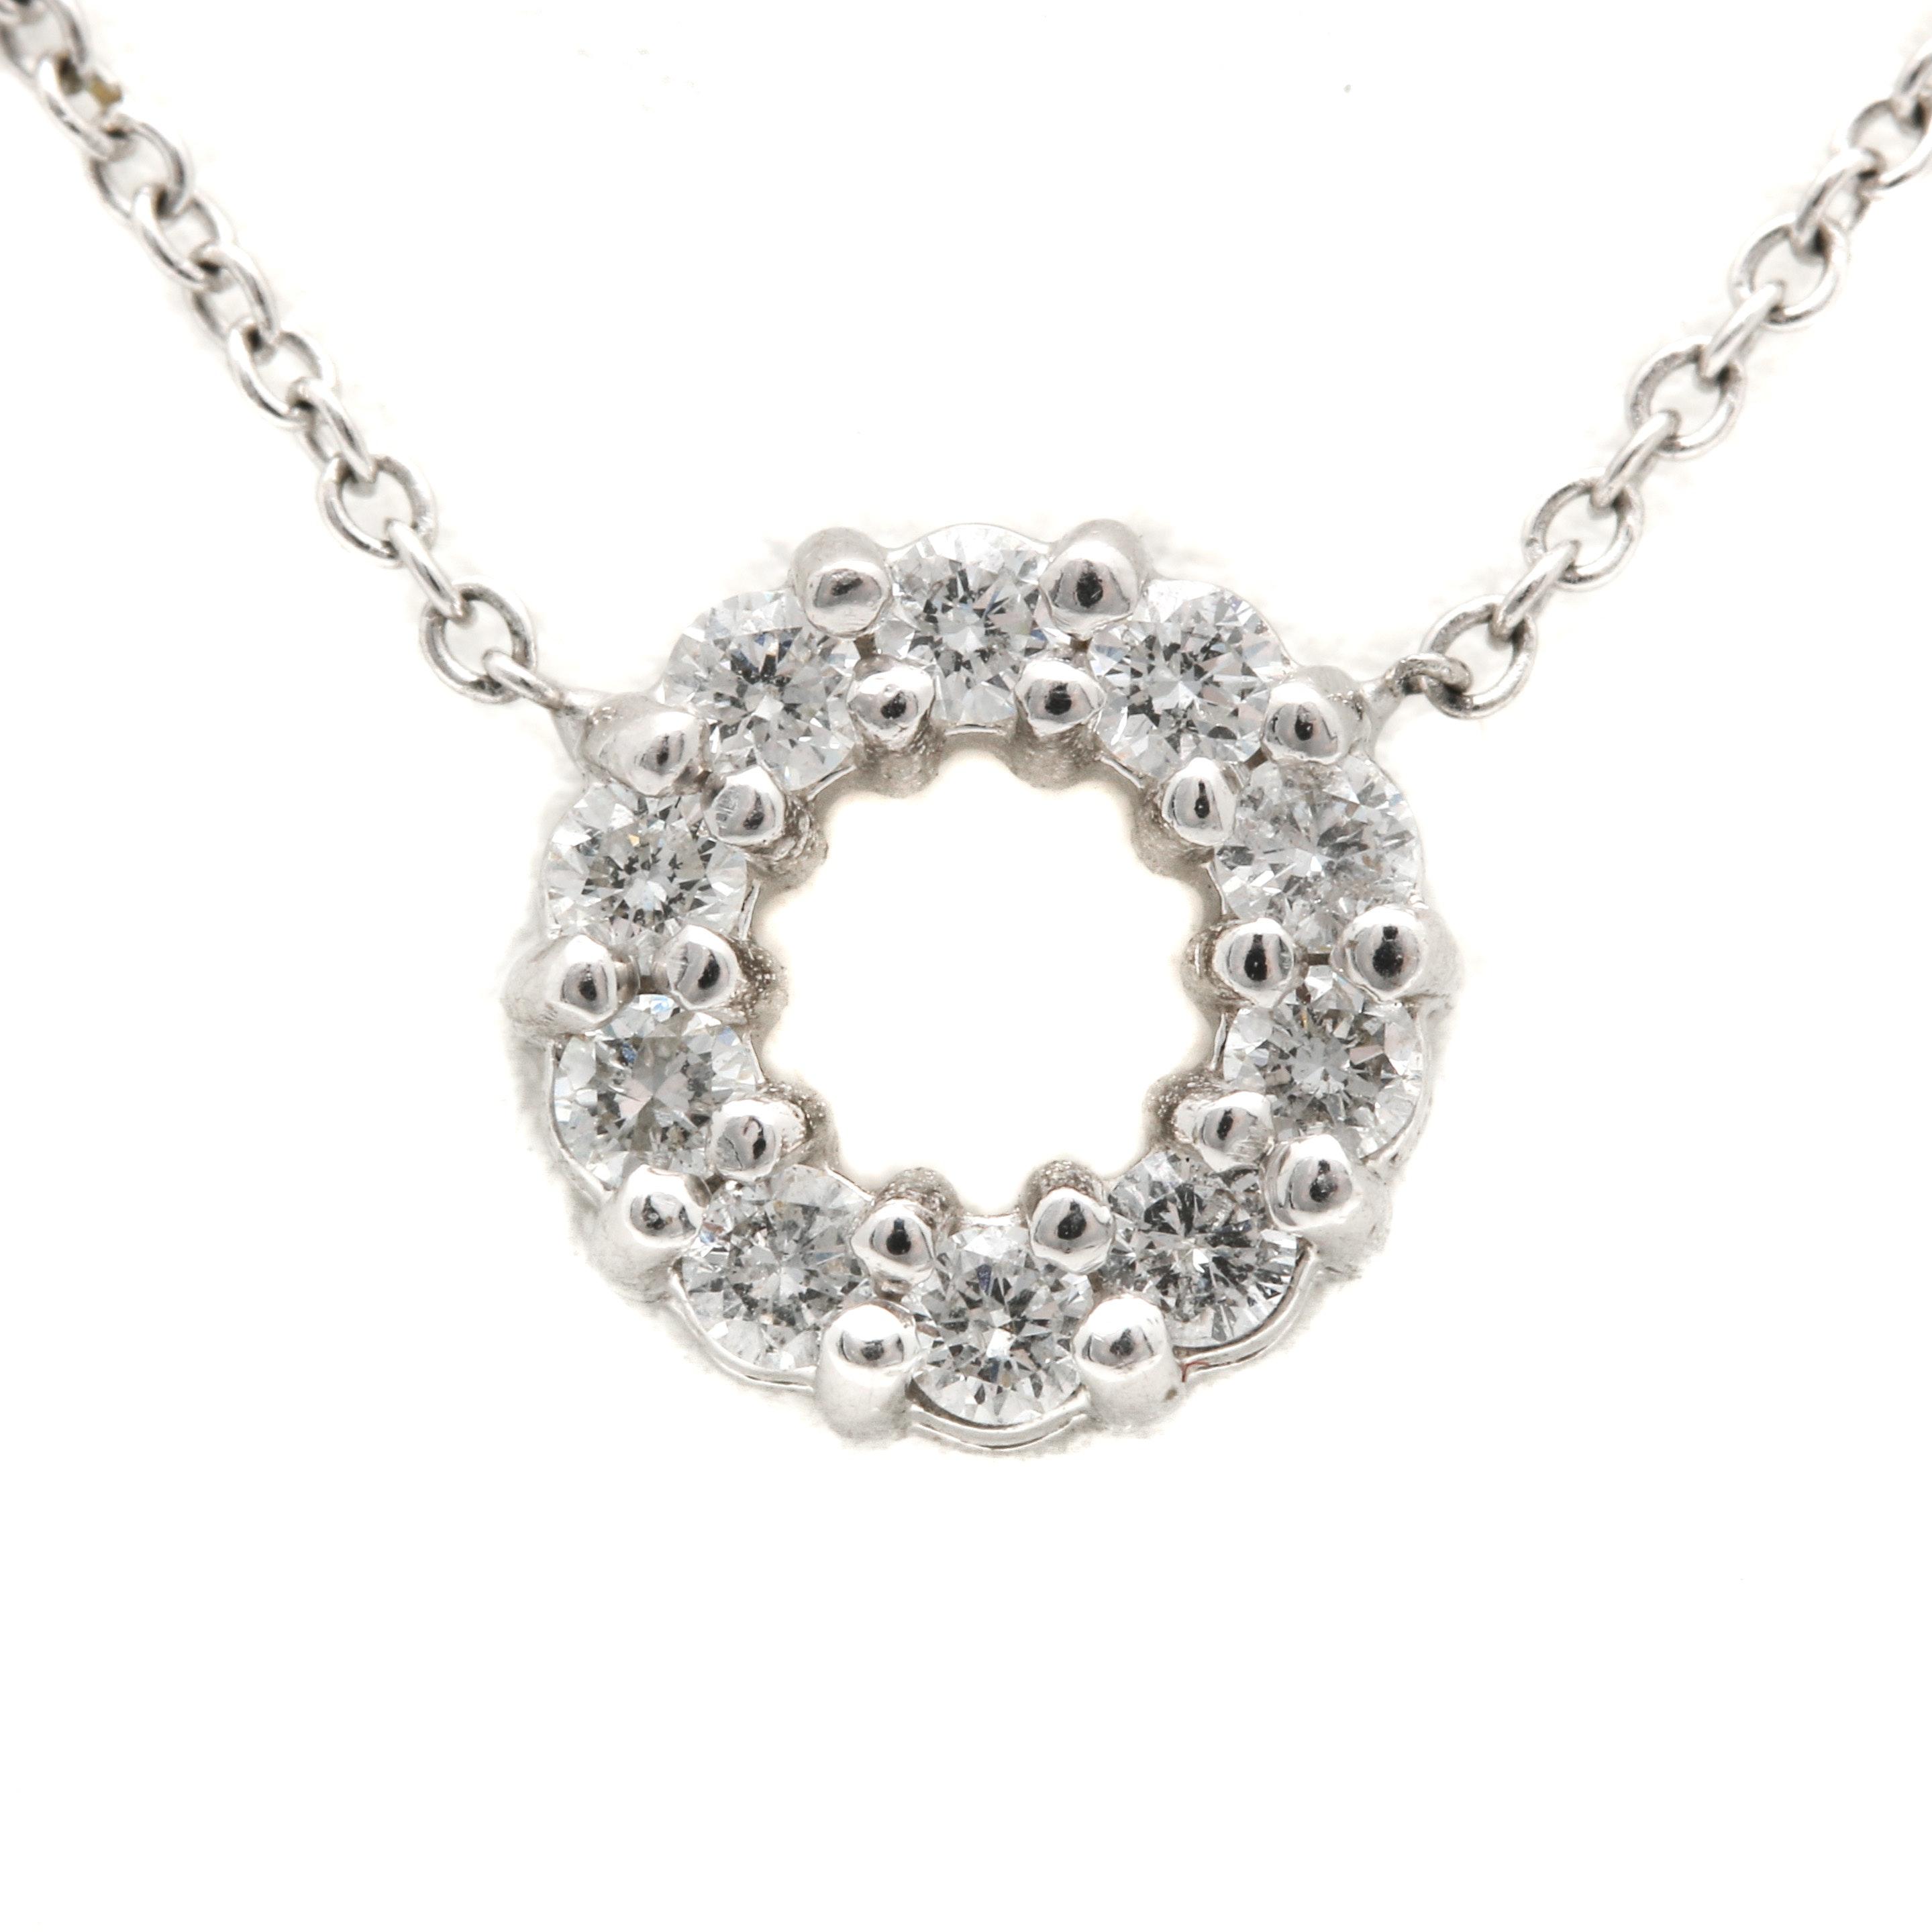 14K White Gold Diamond Circle Necklace